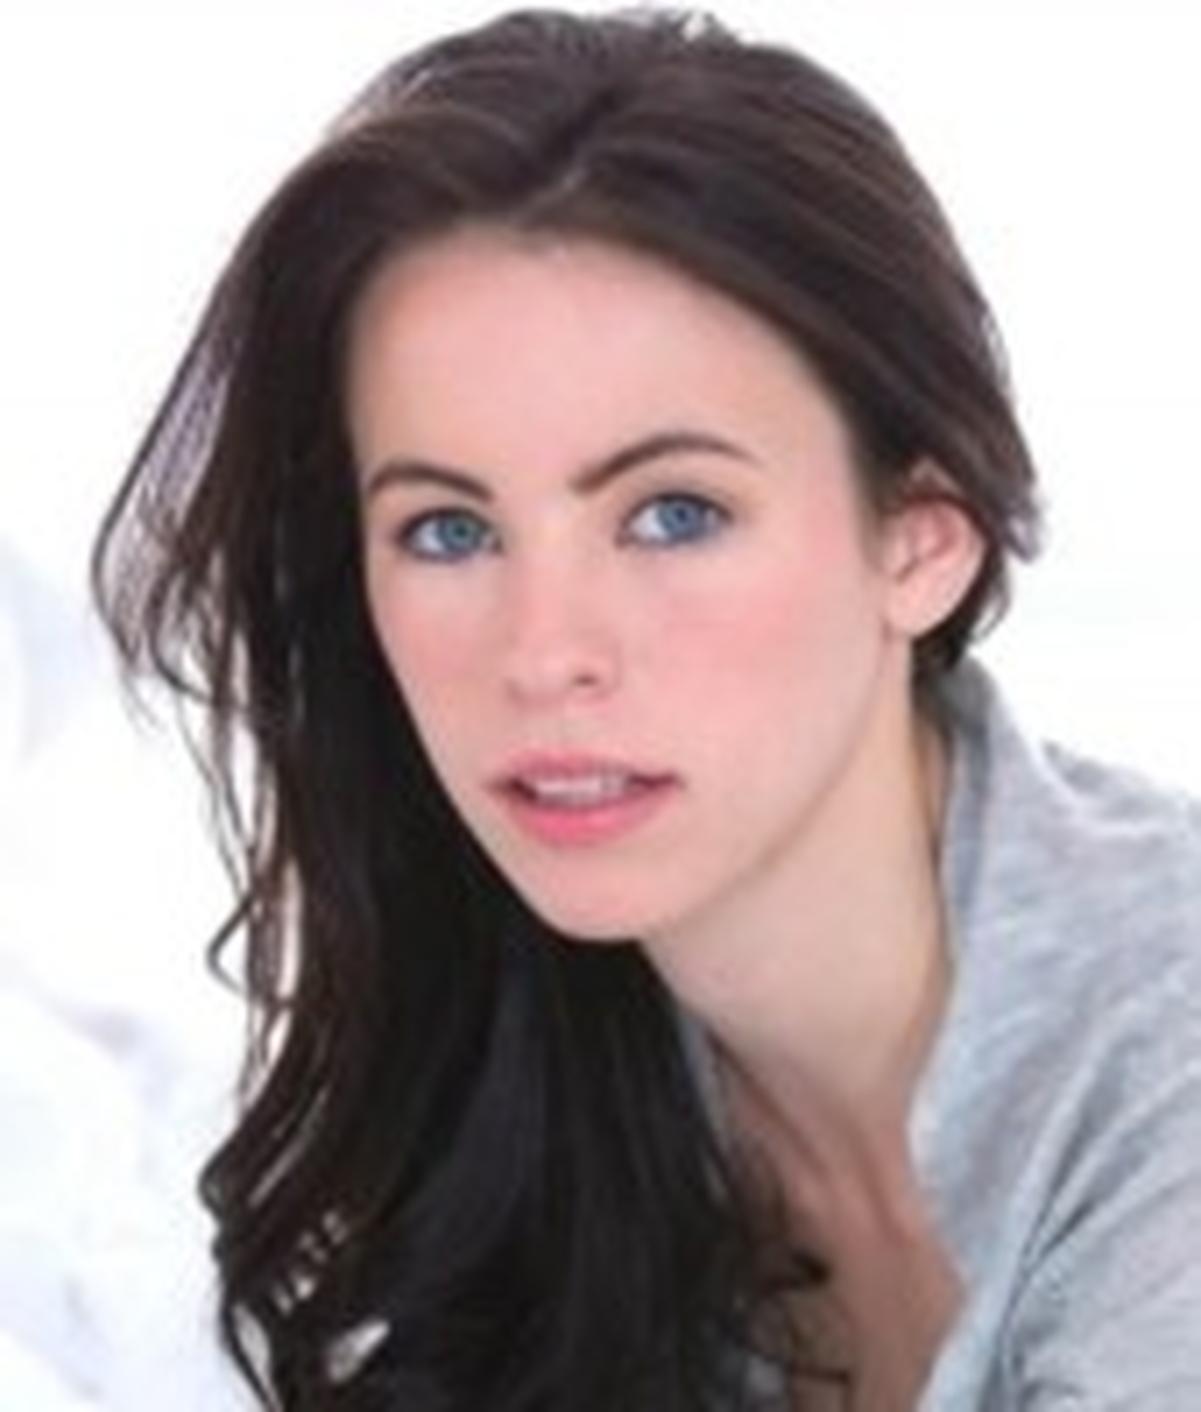 Veronica Radke | Wiki & Bio | Everipedia